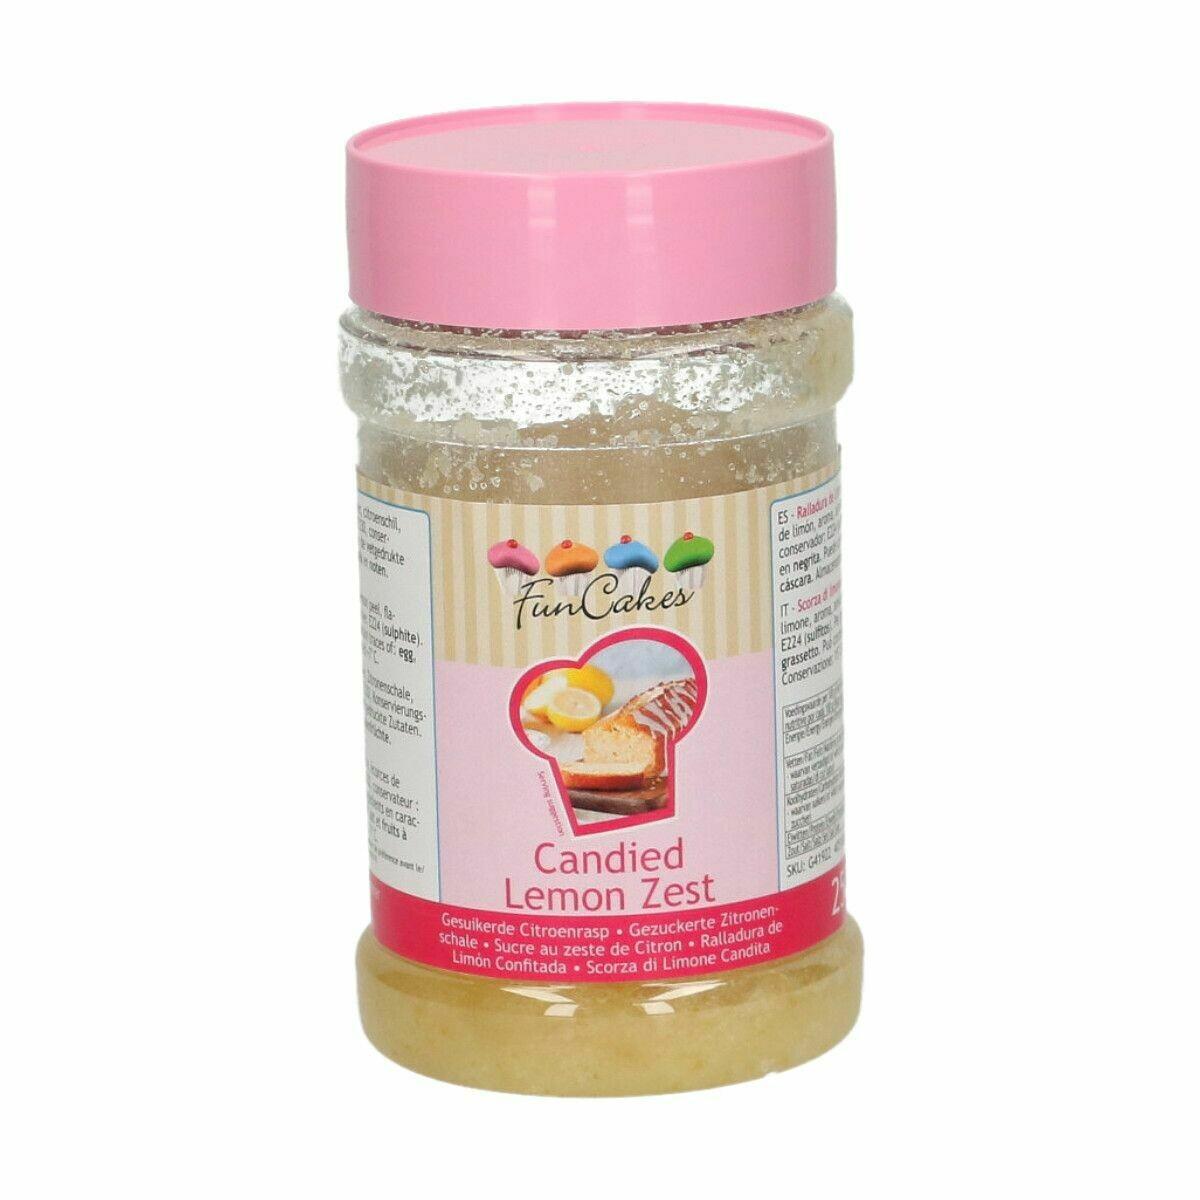 FunCakes Candied Lemon Zest 250g - Ζαχαρωμένη φλούδα λεμονιού 250γρ